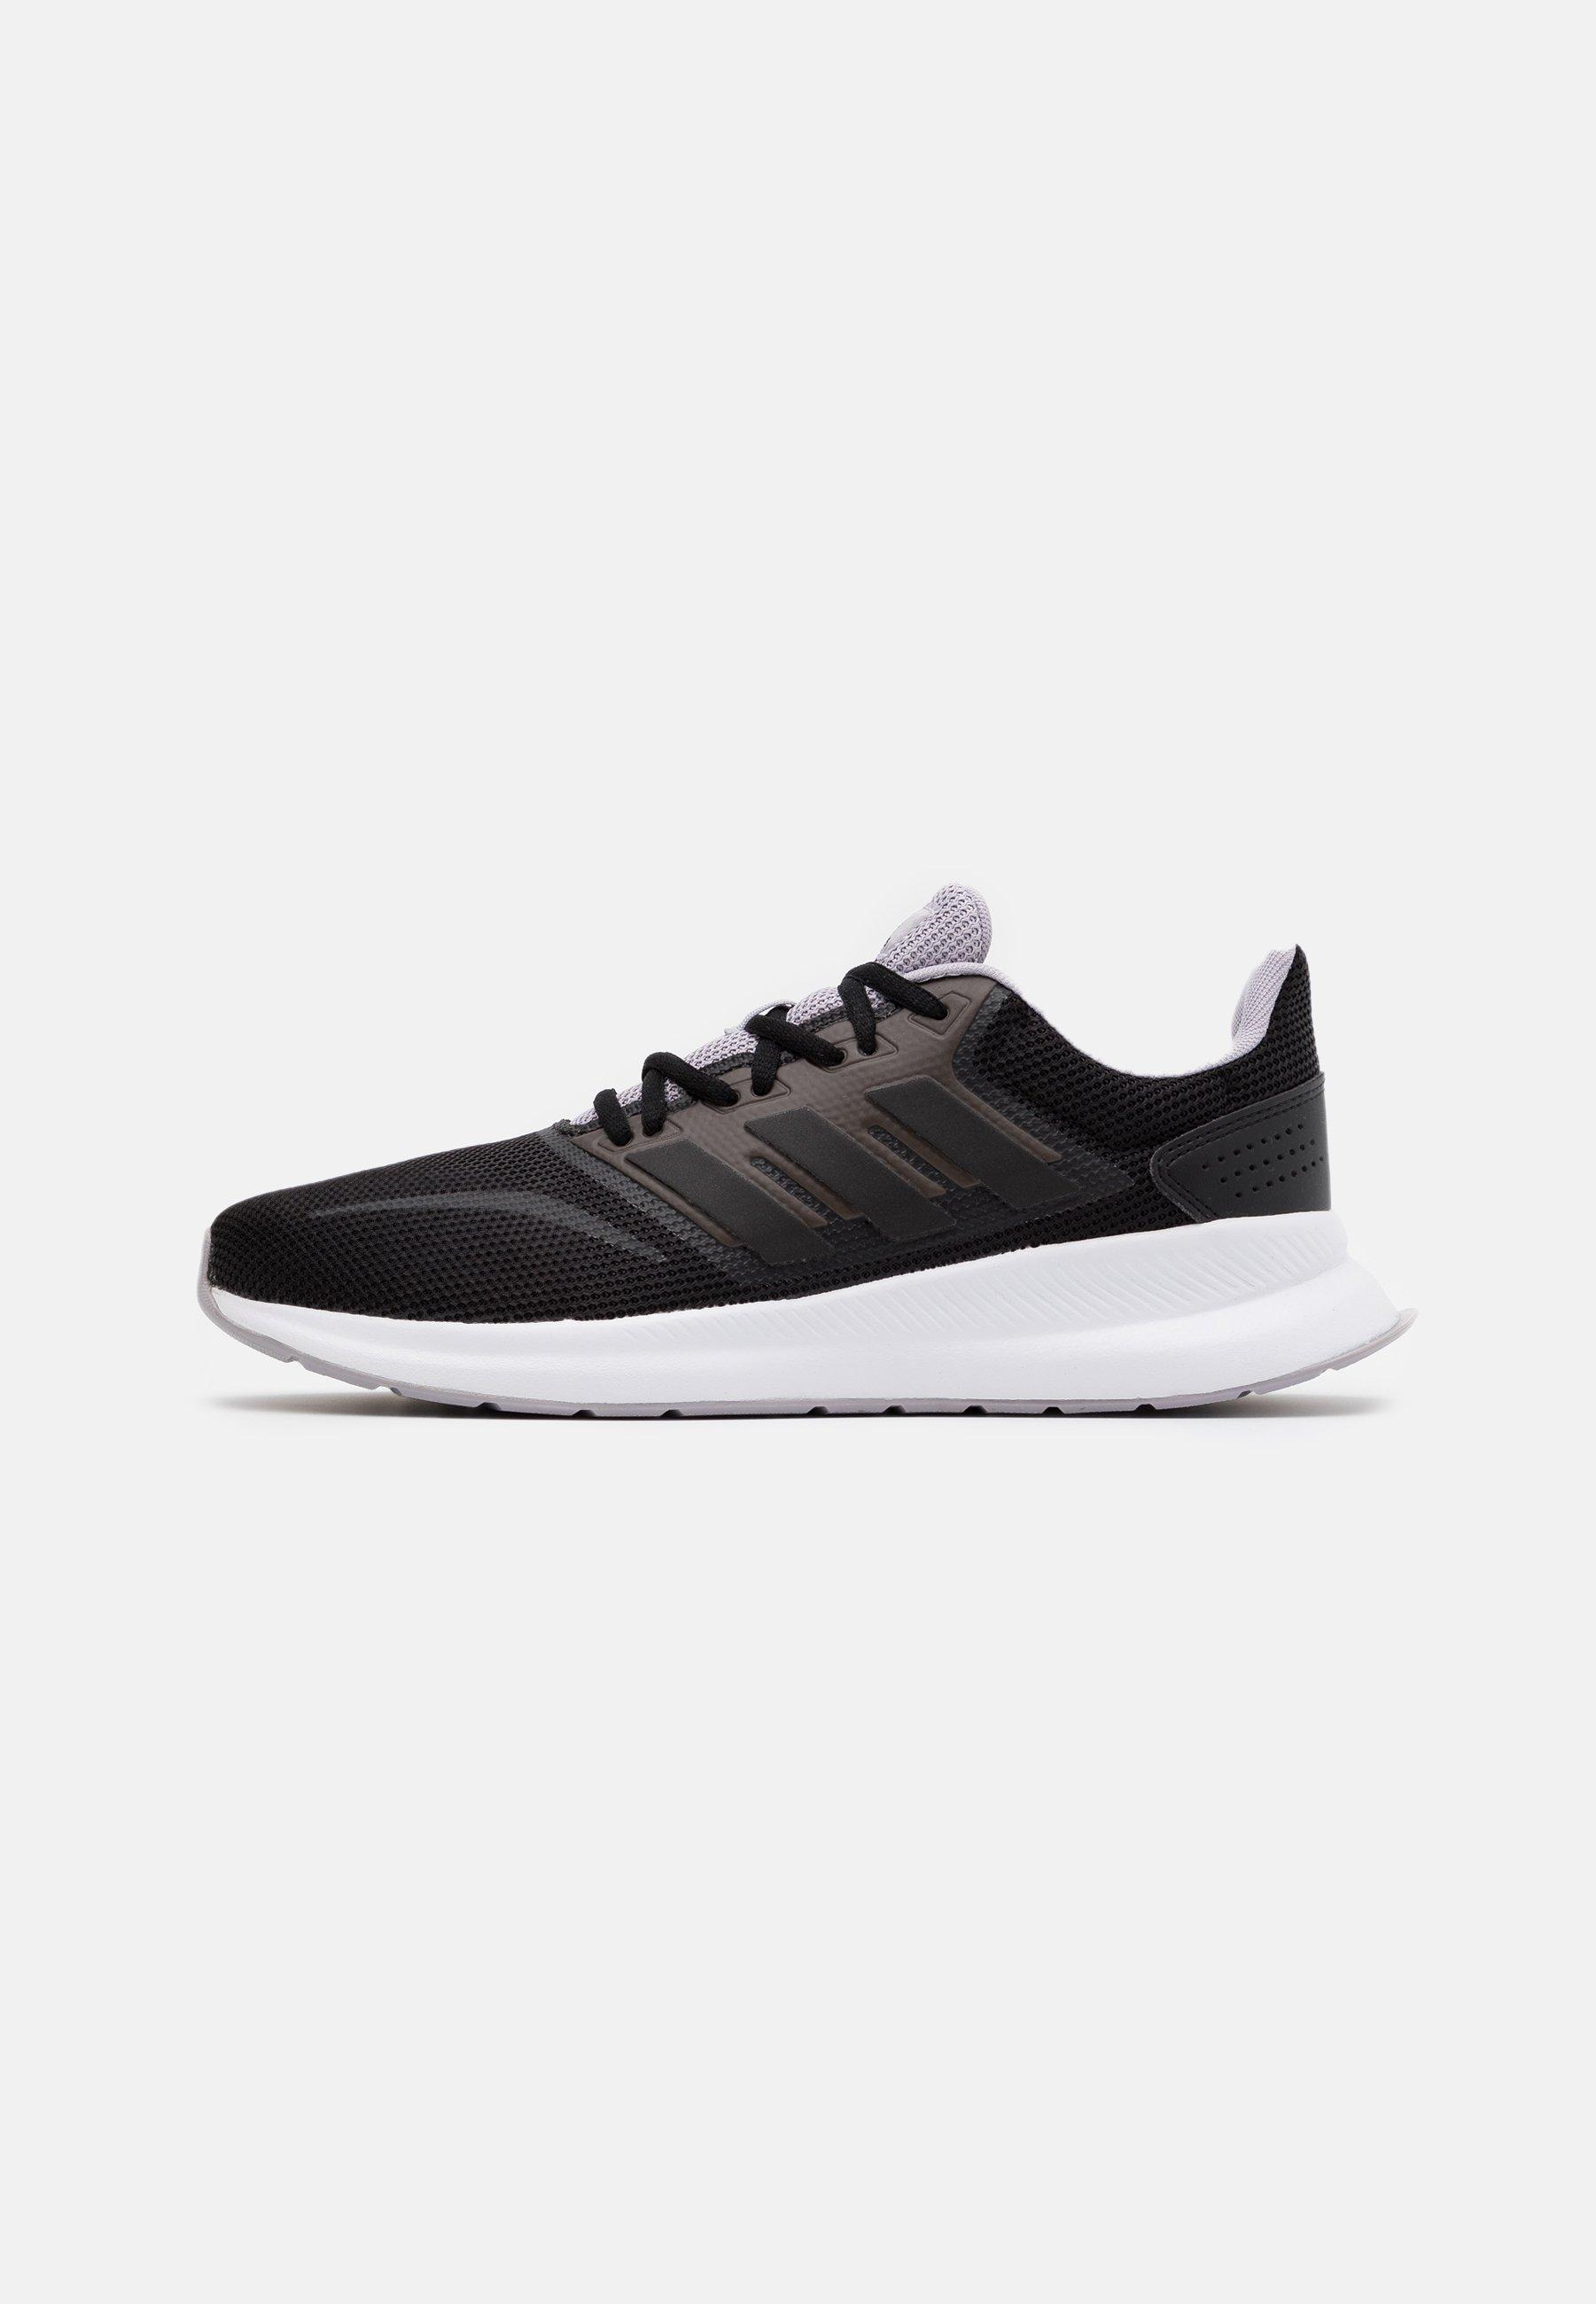 Adidas Performance Runfalcon Classic Sports Running Shoes Laufschuh Neutral Core Black Glow Grey Schwarz Zalando De